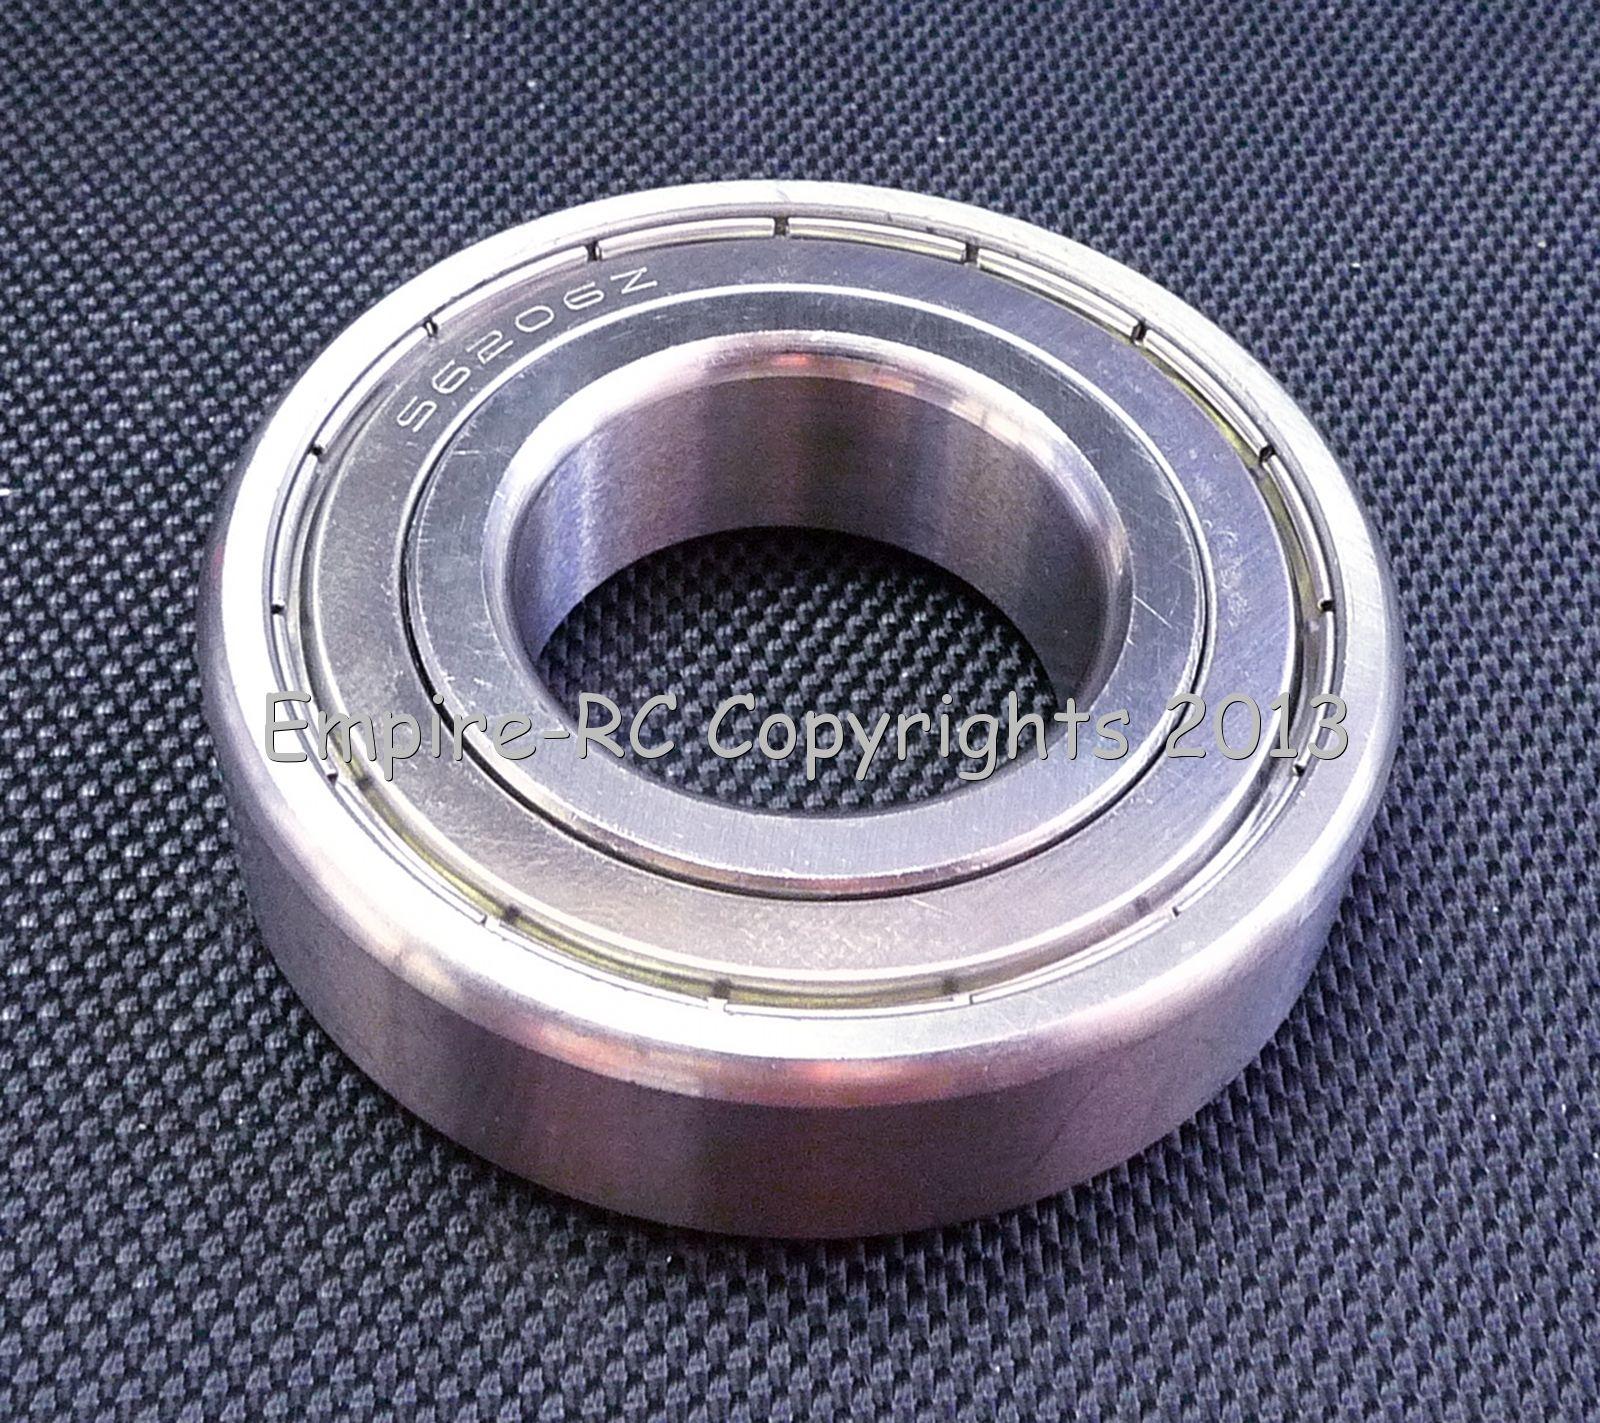 4 PCS 10x15x4mm S6700ZZ 440c Stainless Steel Ball Bearing 6700ZZ 10*15*4